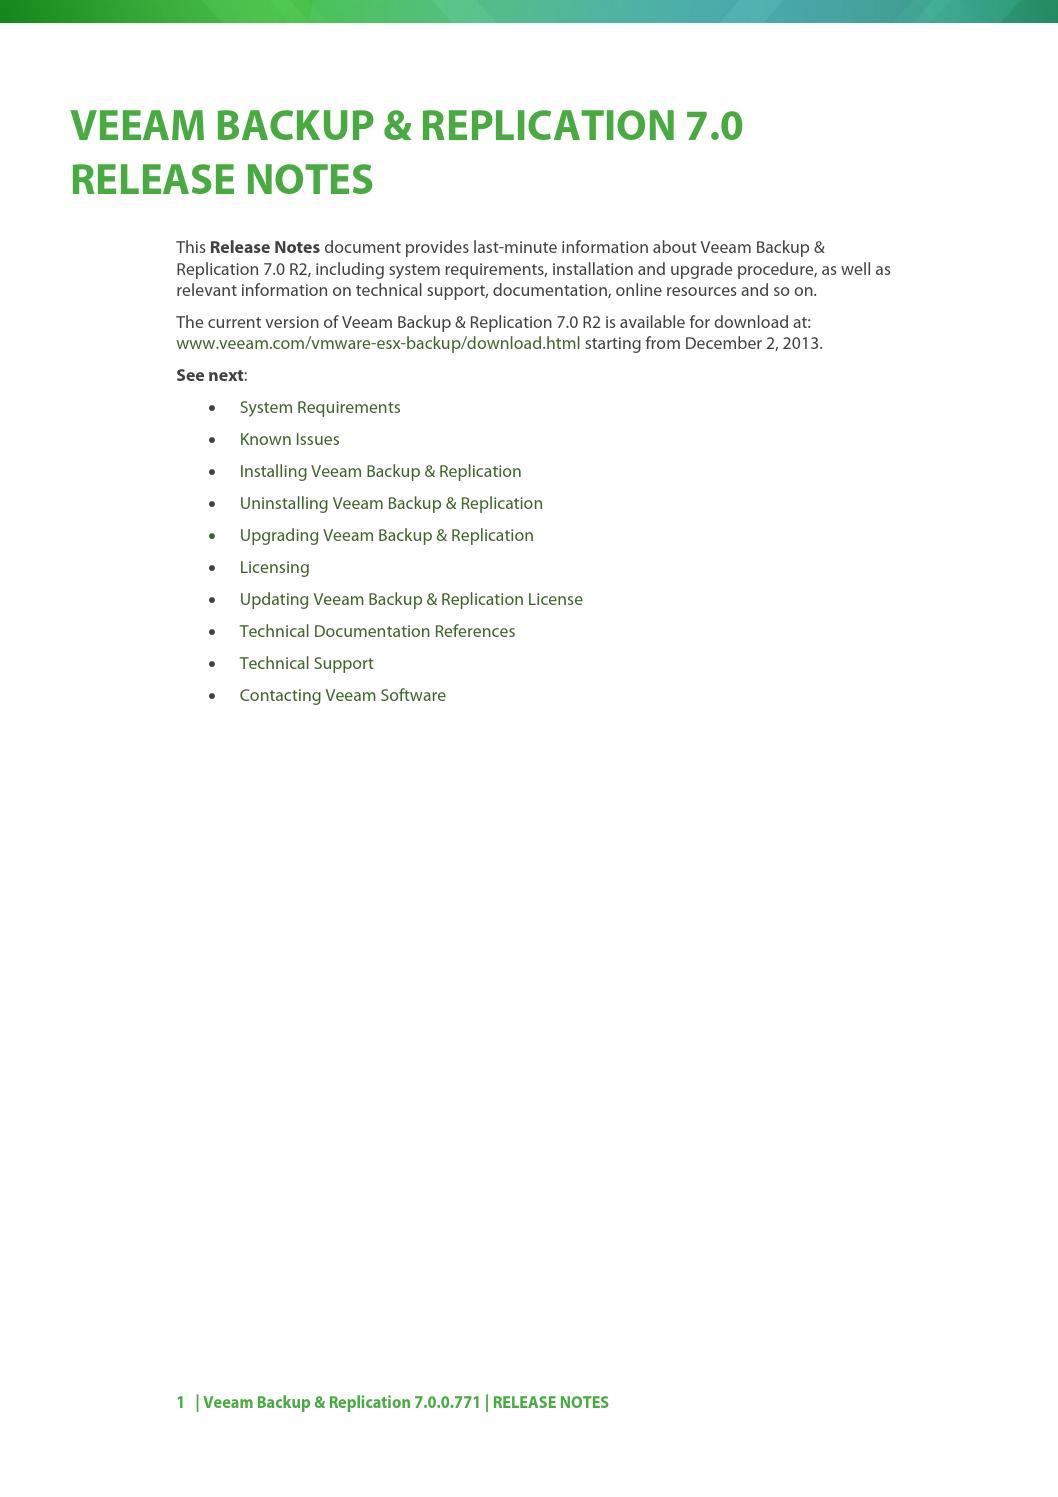 Veeam backup 7 0 release notes by danielegregori - issuu